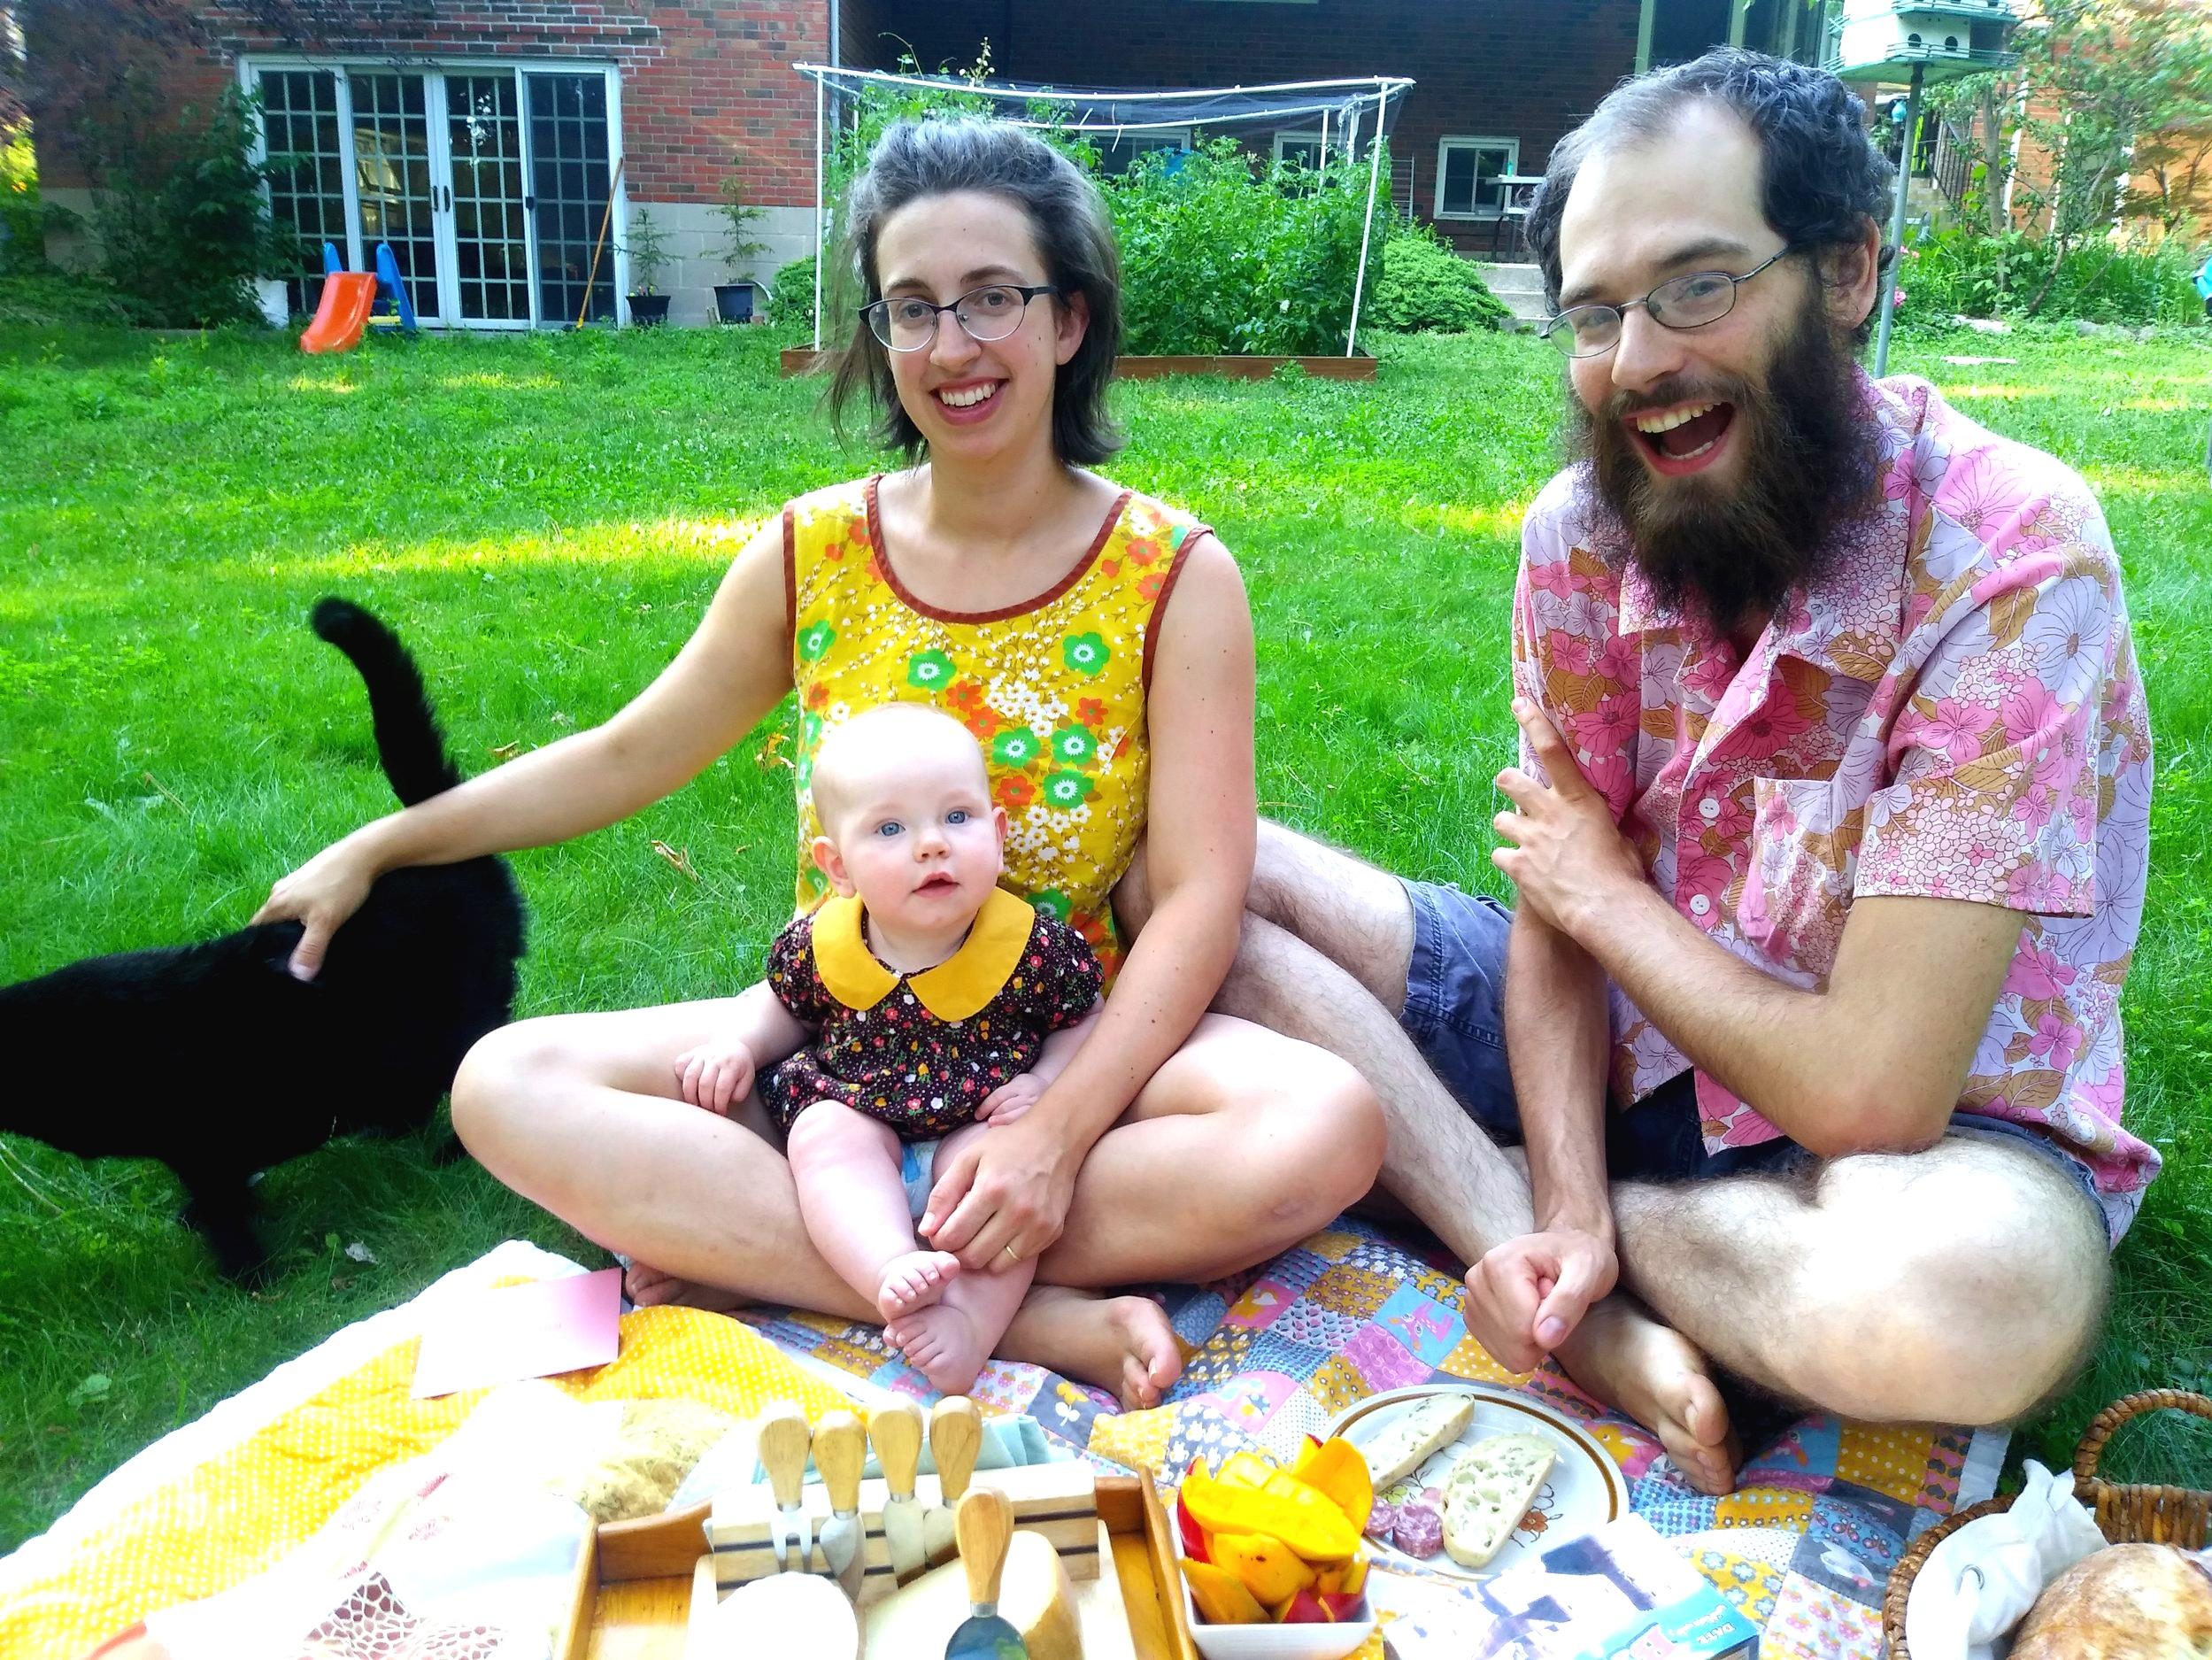 The family behind Beardbangs Ceramics